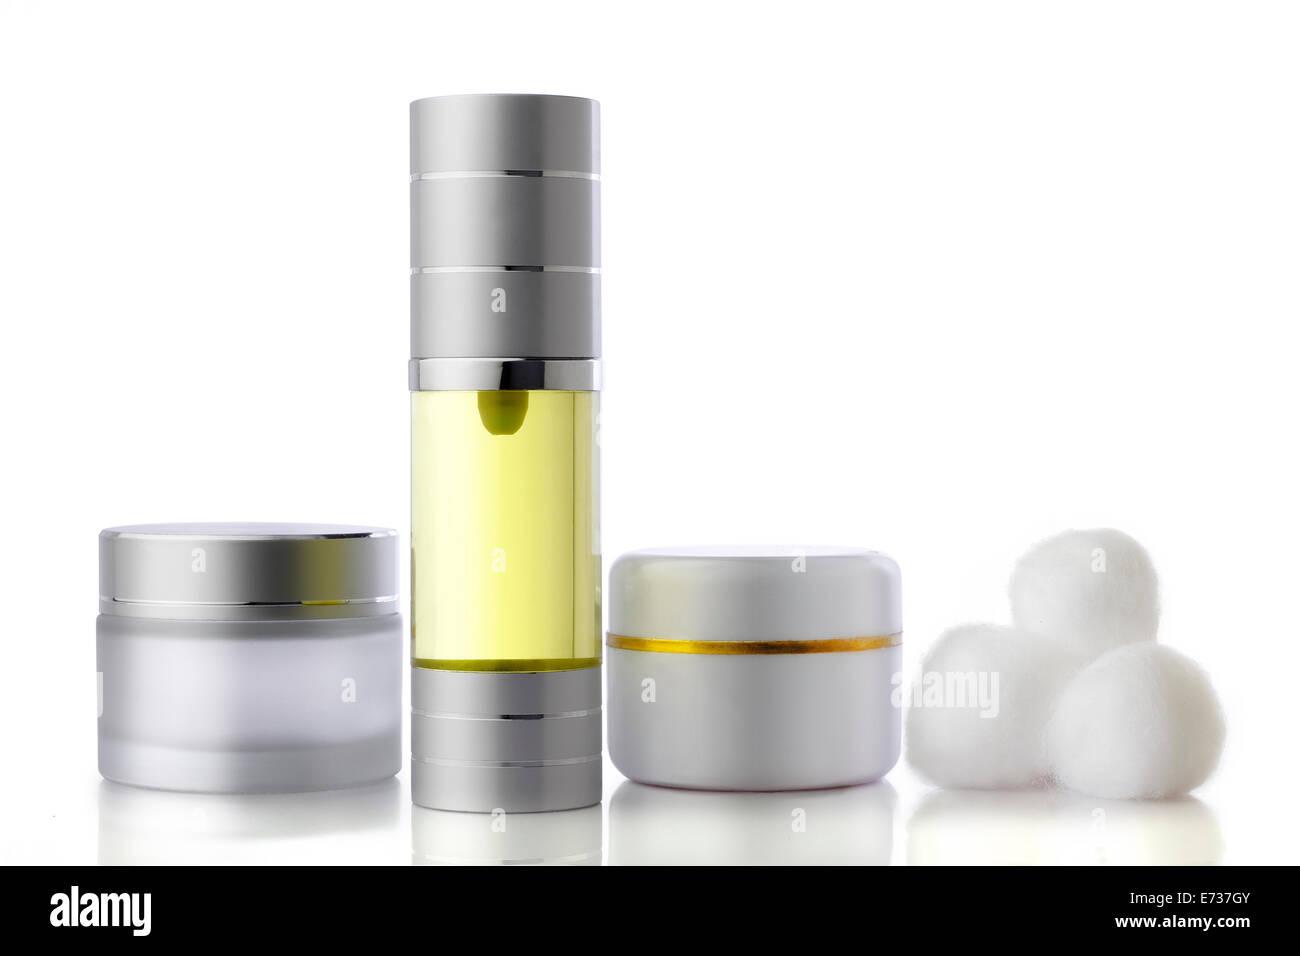 perfume and fragrance bottle isolated on white - Stock Image